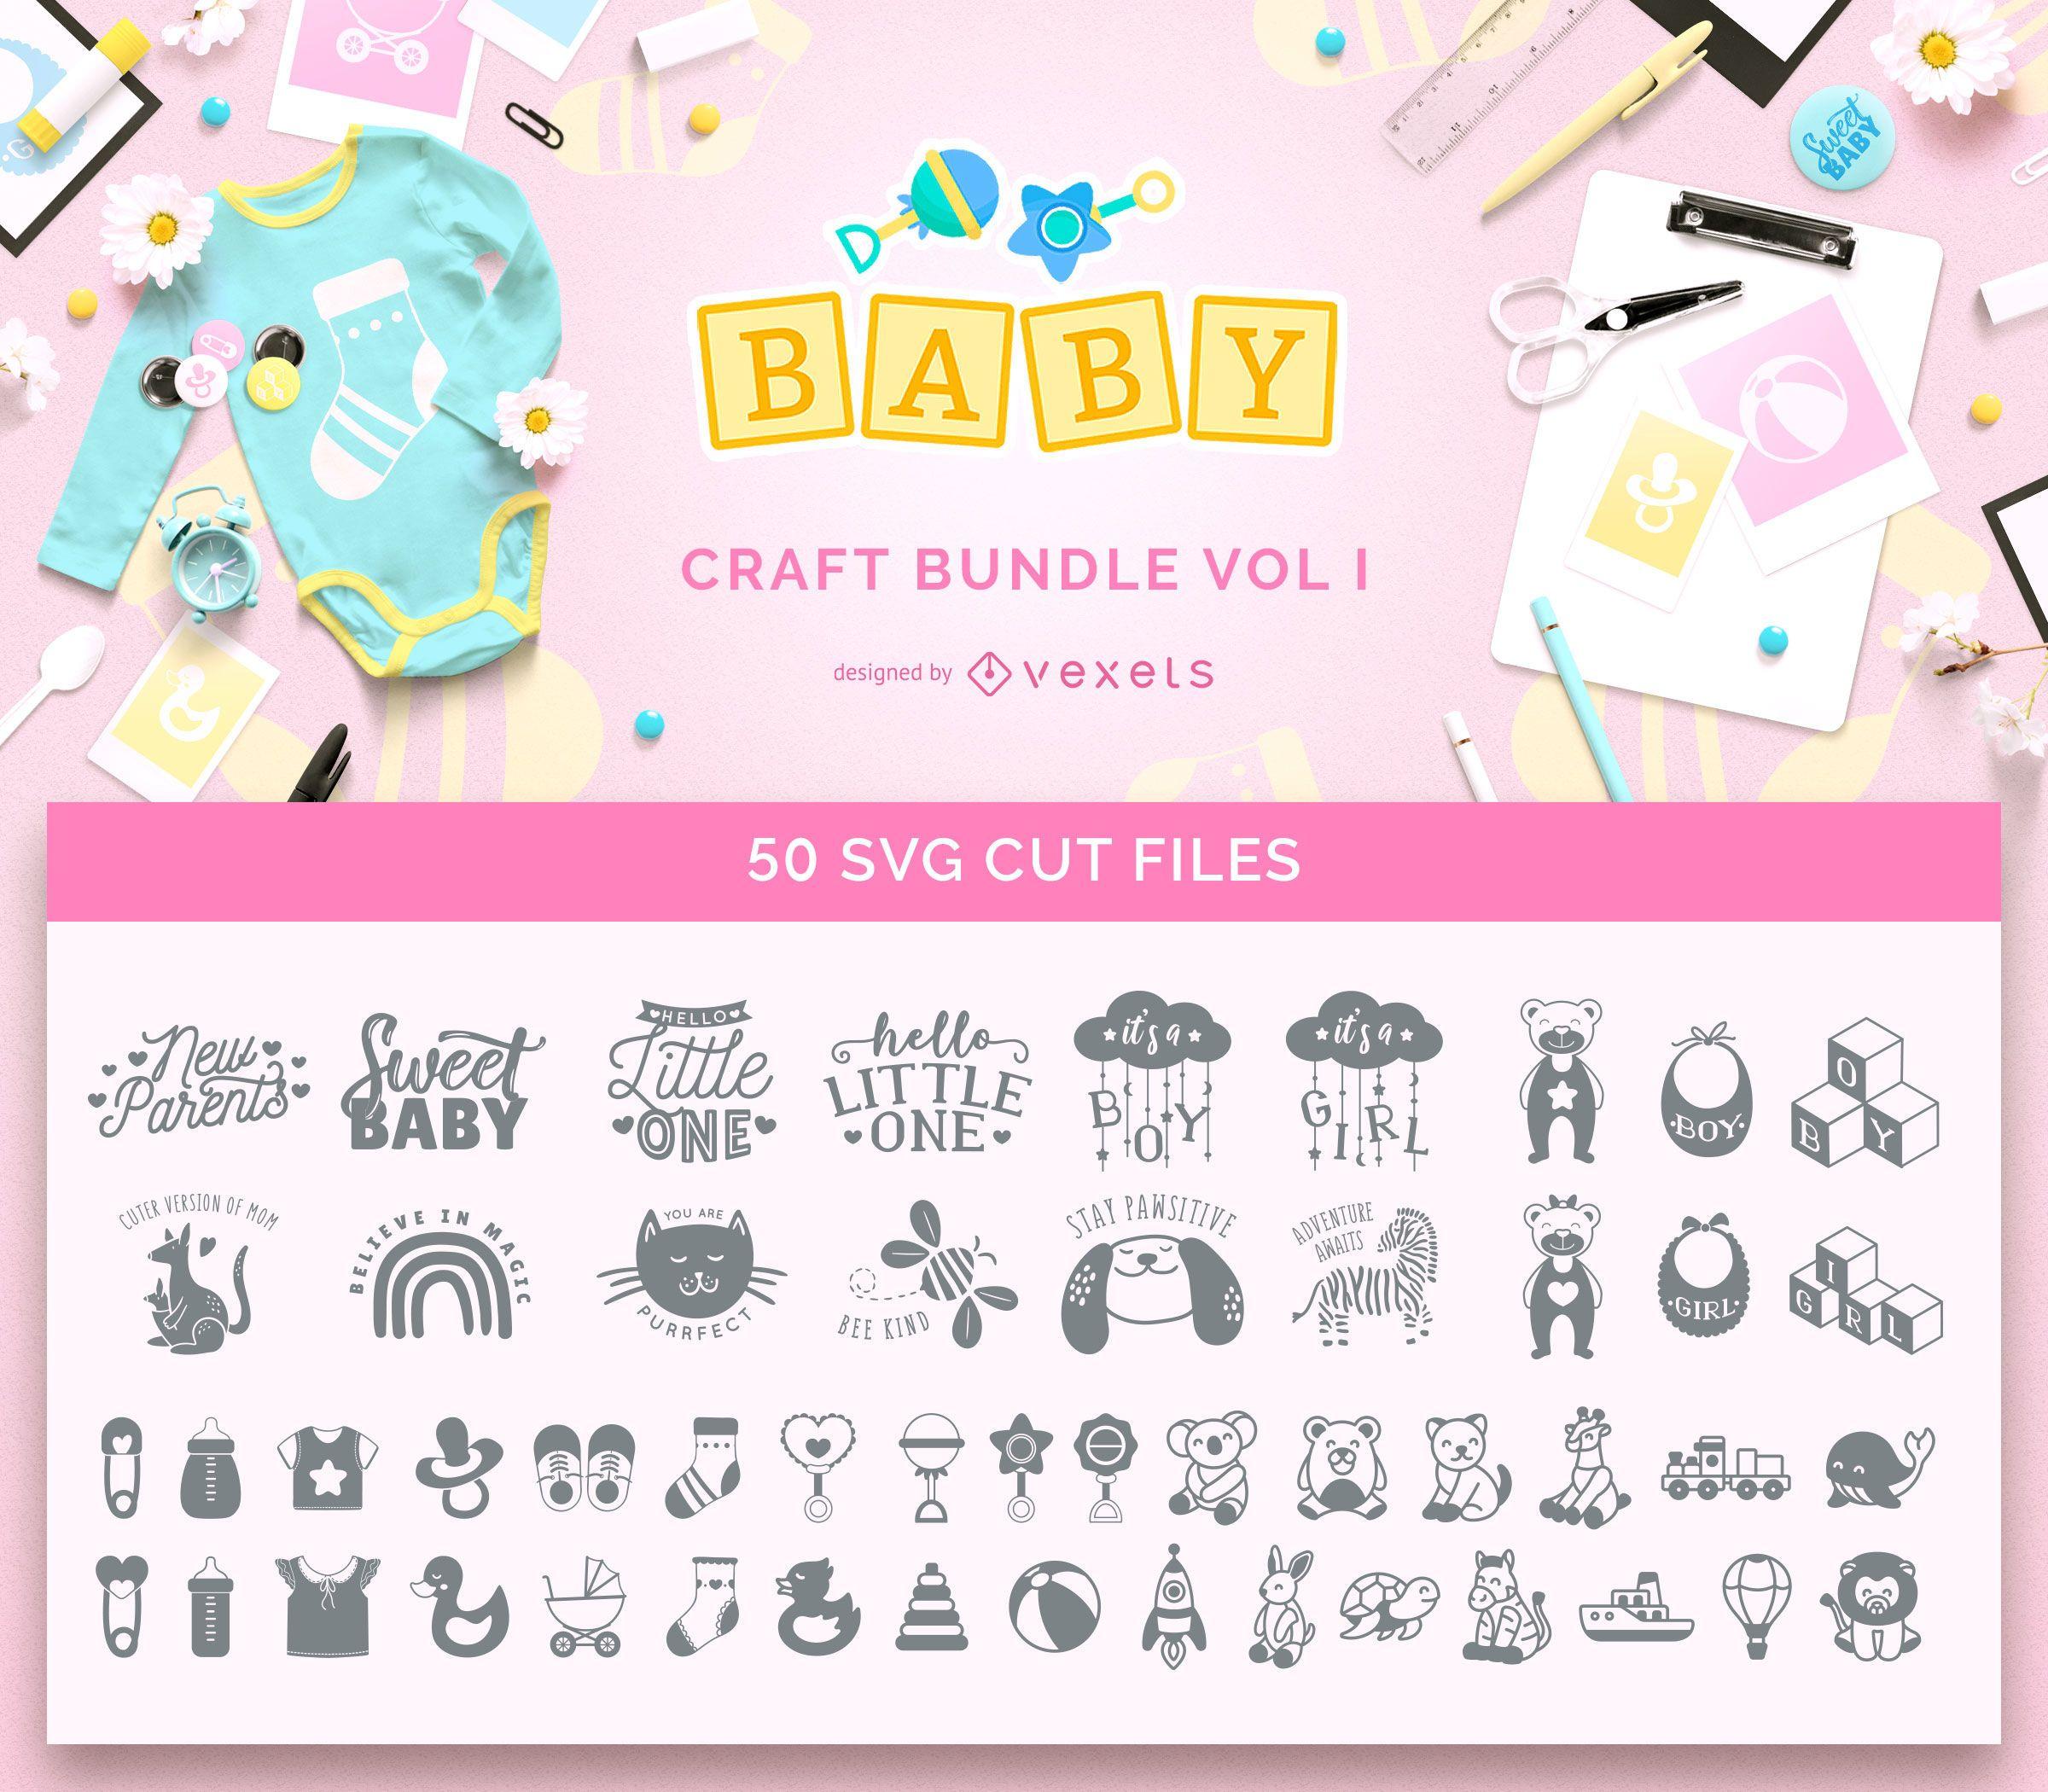 Baby Craft Bundle Vol I